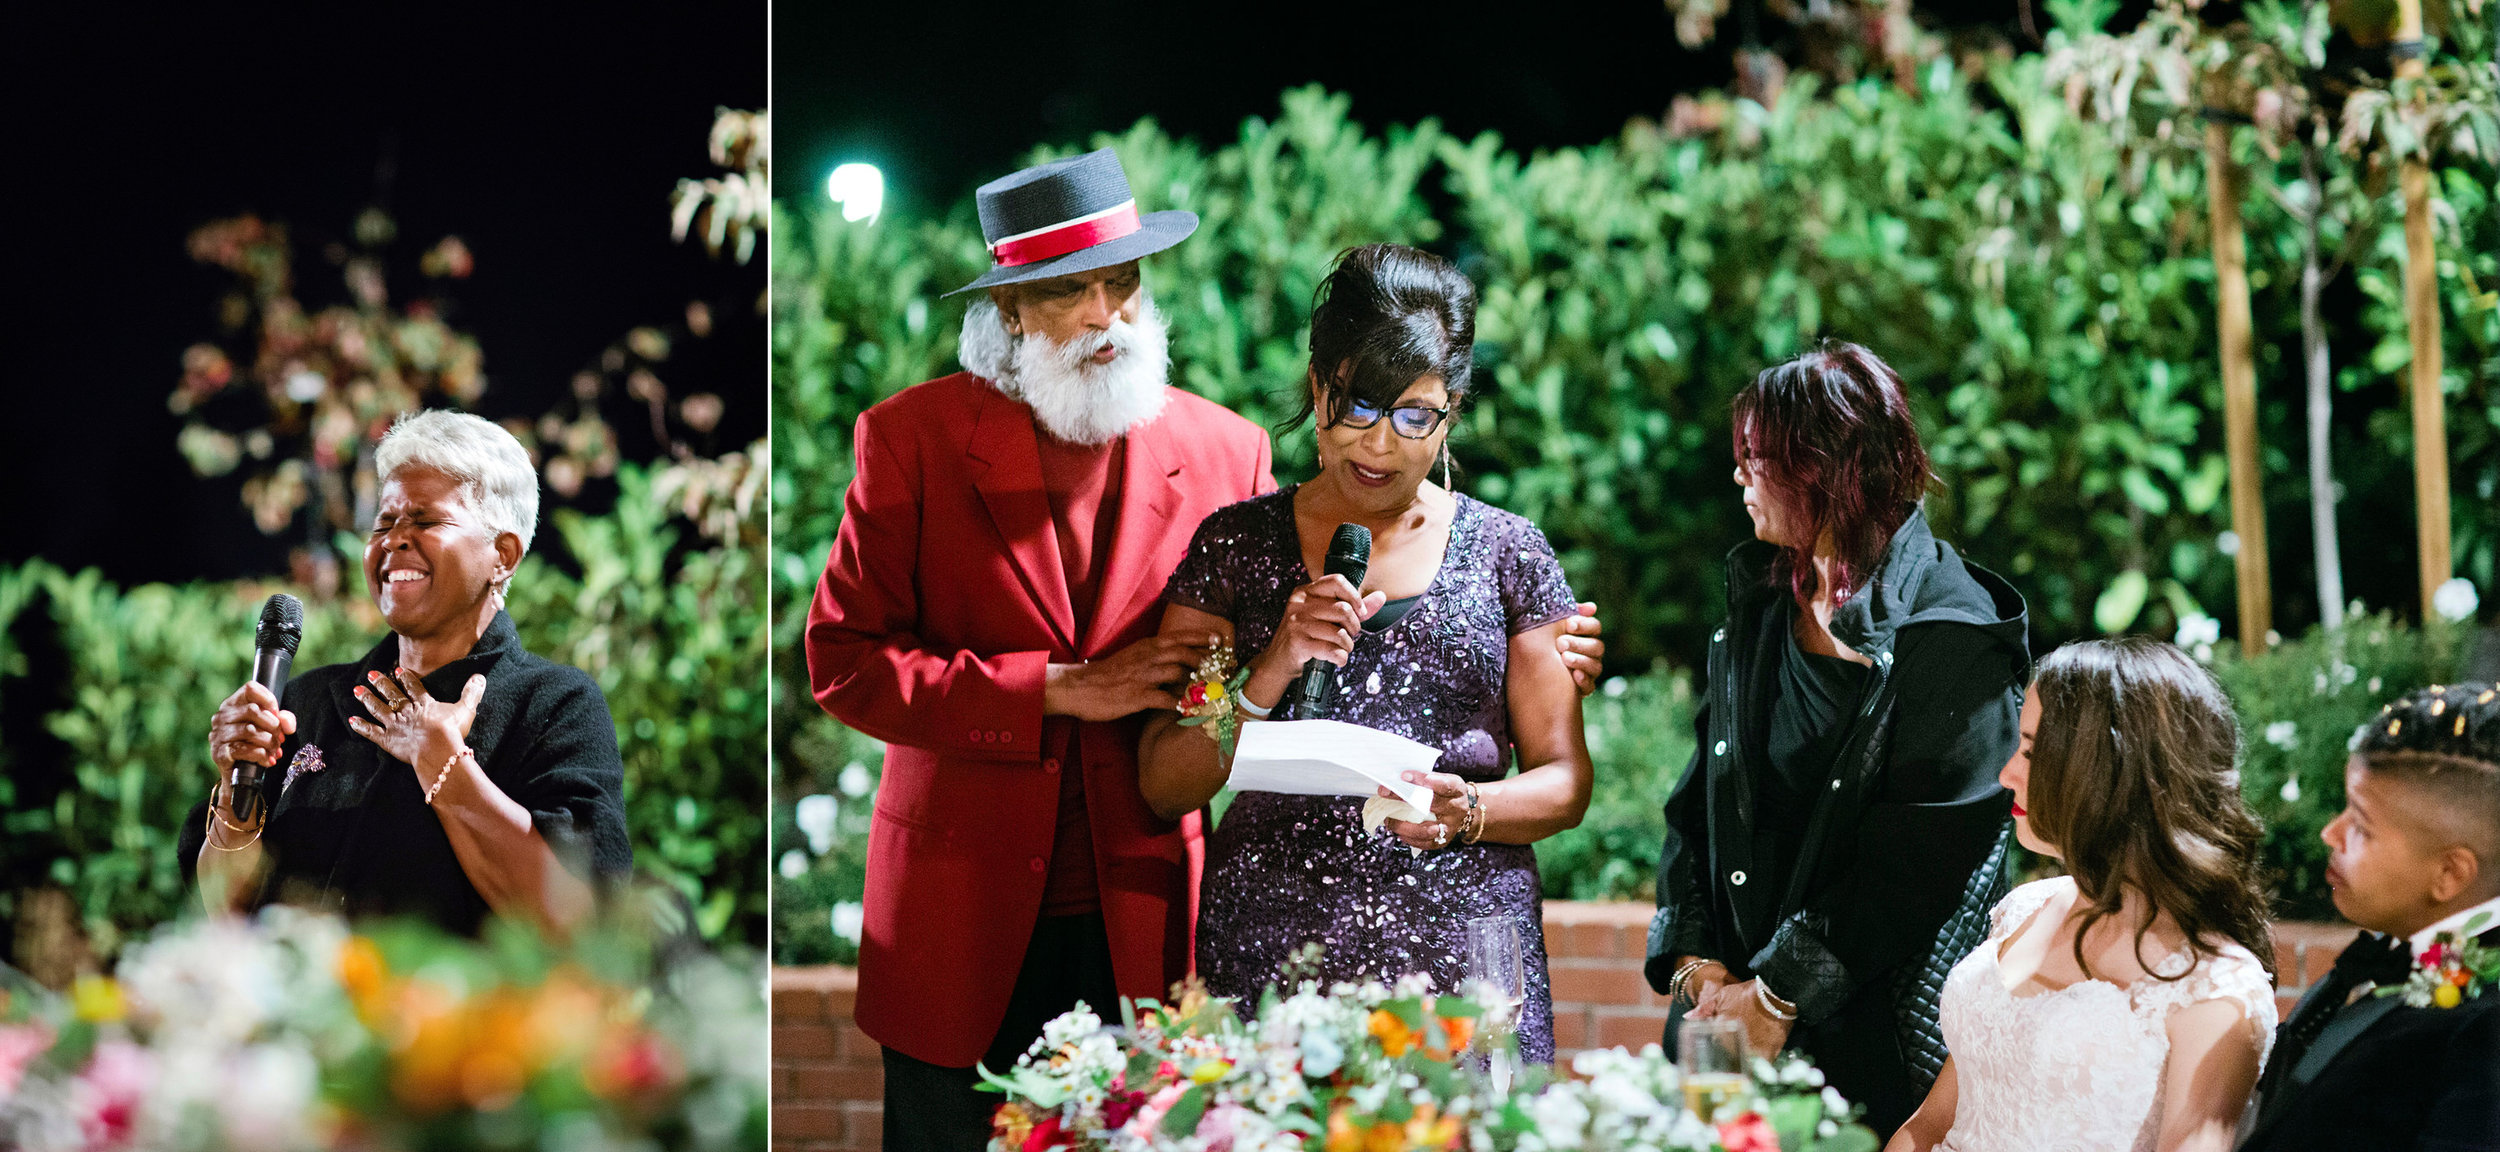 Piedmont-Hall-Community-Wedding-072 copy.jpg